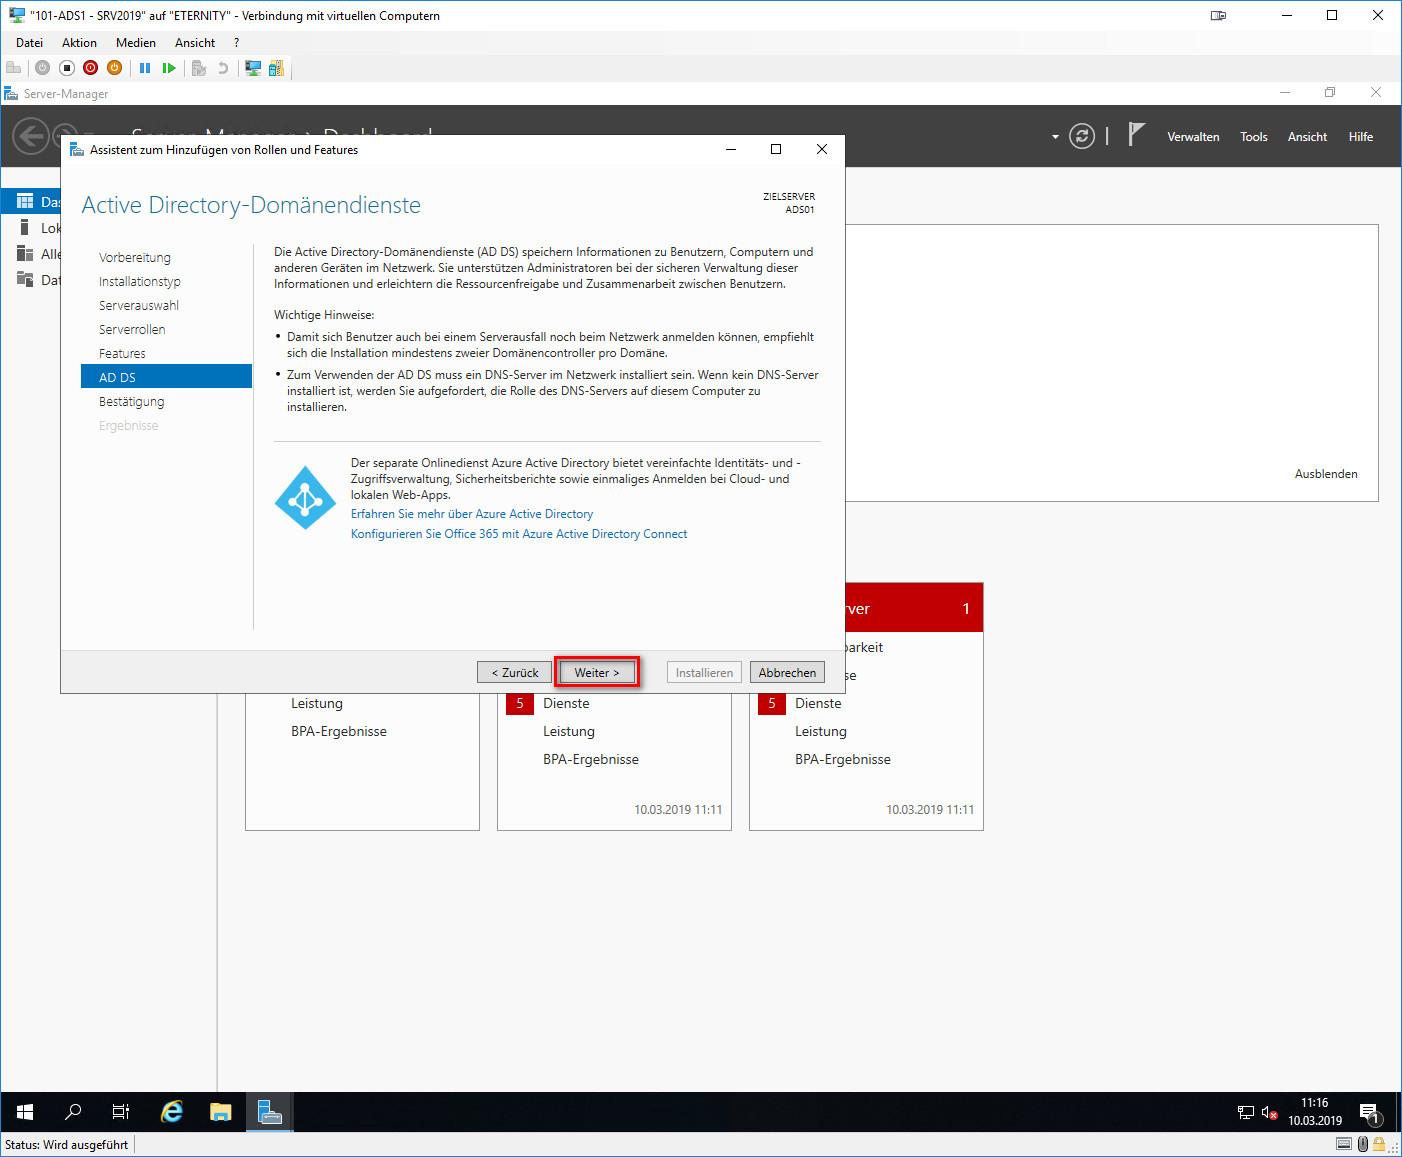 Active Directory-Domänendienste